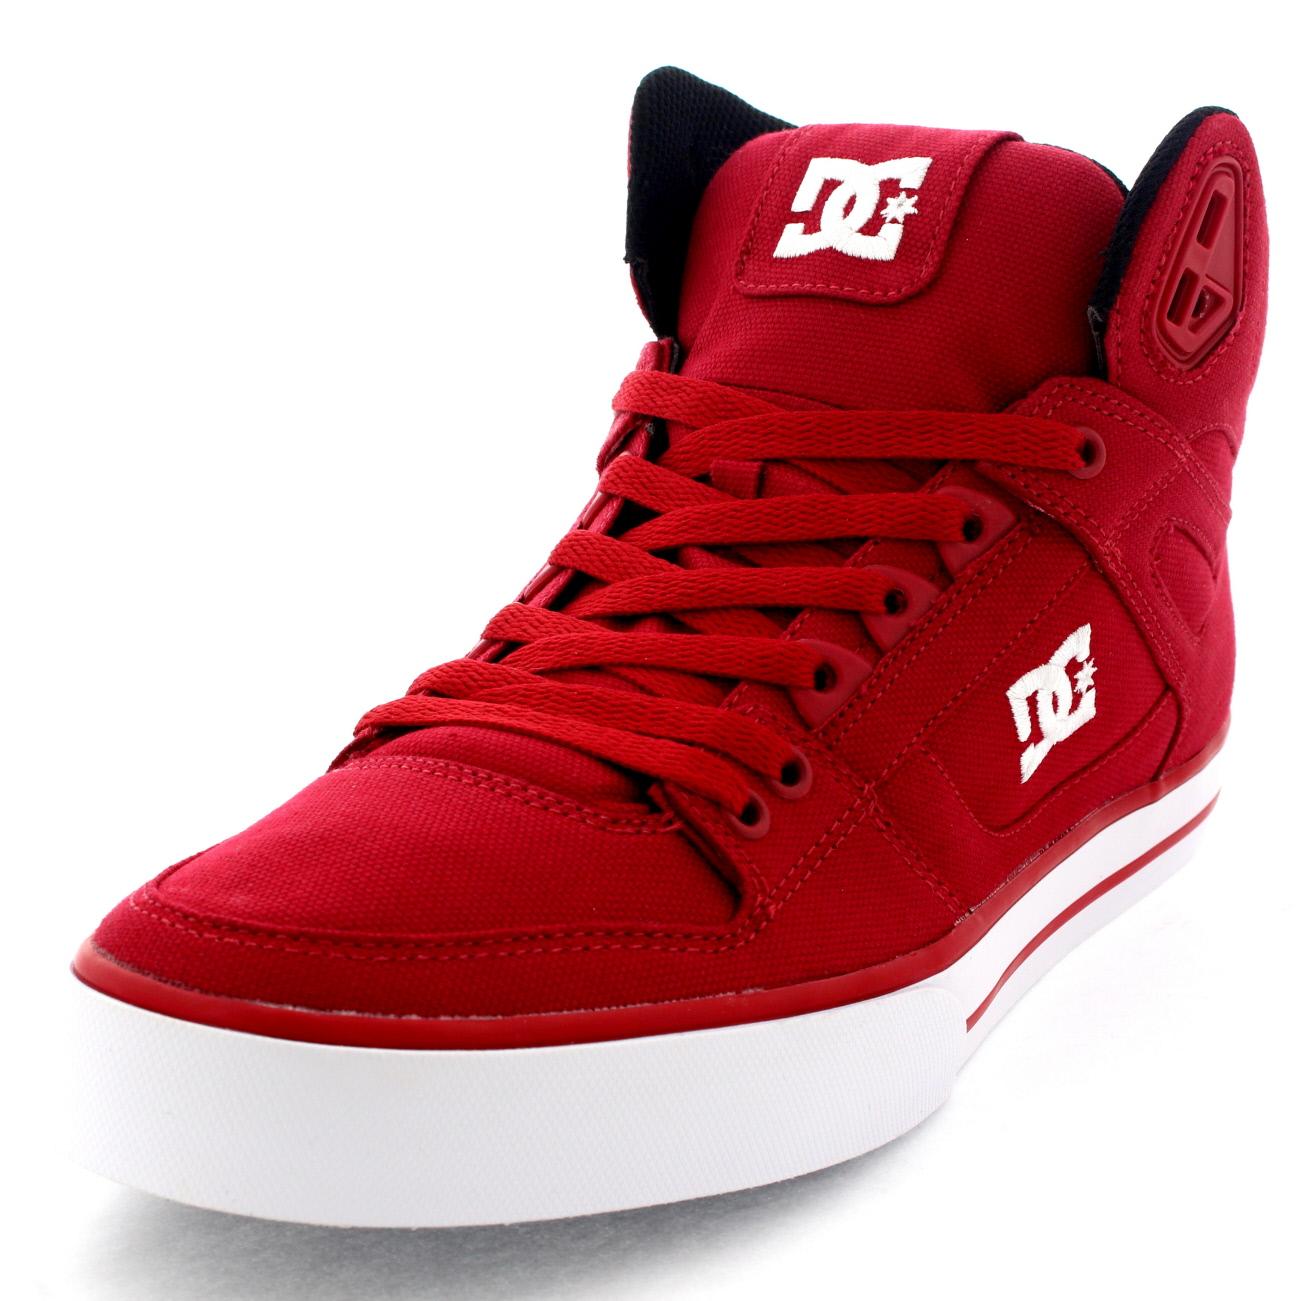 Alta Dc Shoes Cime Uk